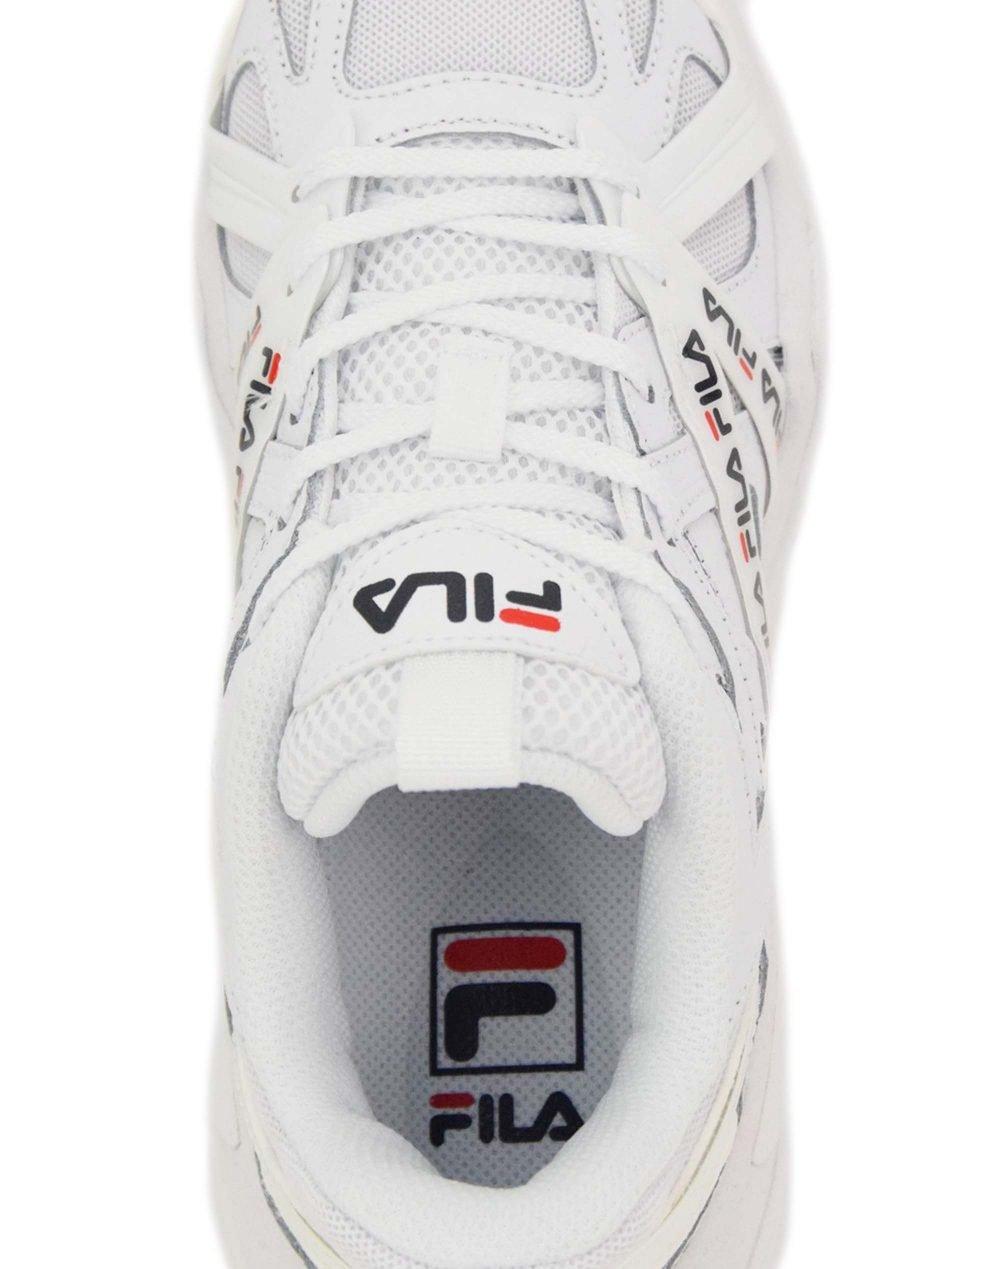 Fila Electrove II (5RM01535-125) White